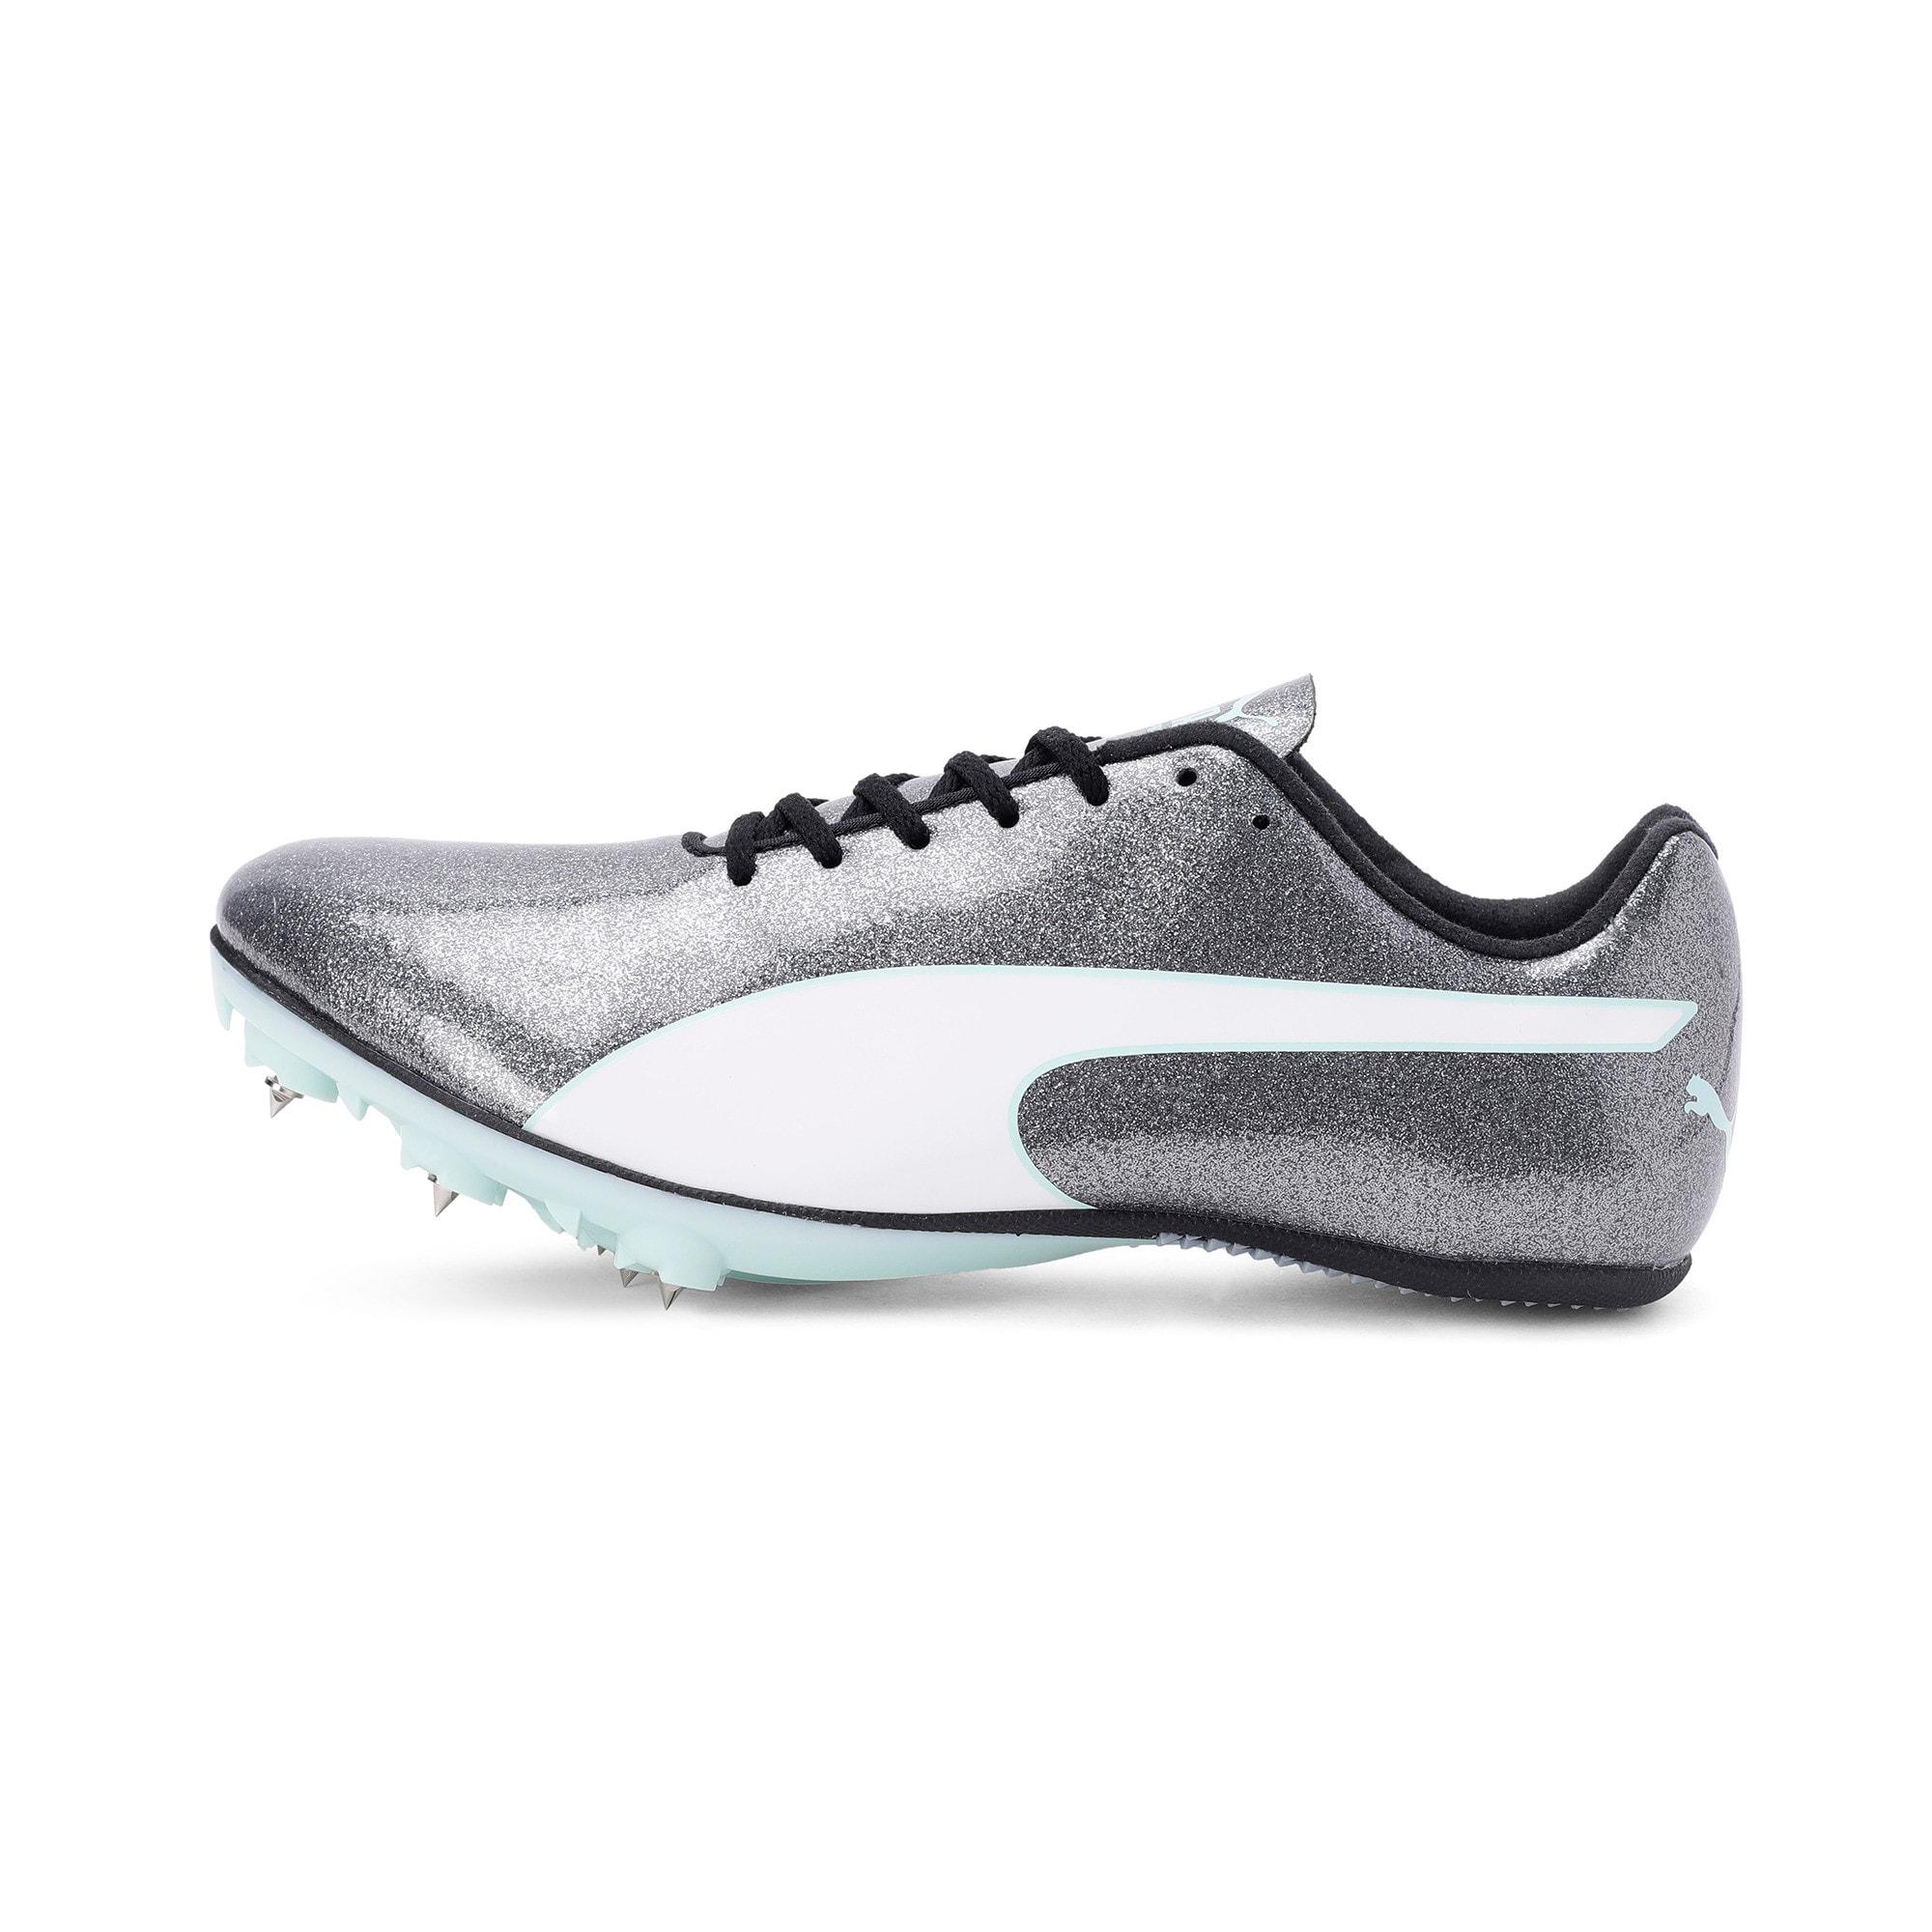 Thumbnail 1 of evoSPEED Sprint 9 Women's Running Shoes, Steel Gray-Fair Aqua-White, medium-IND